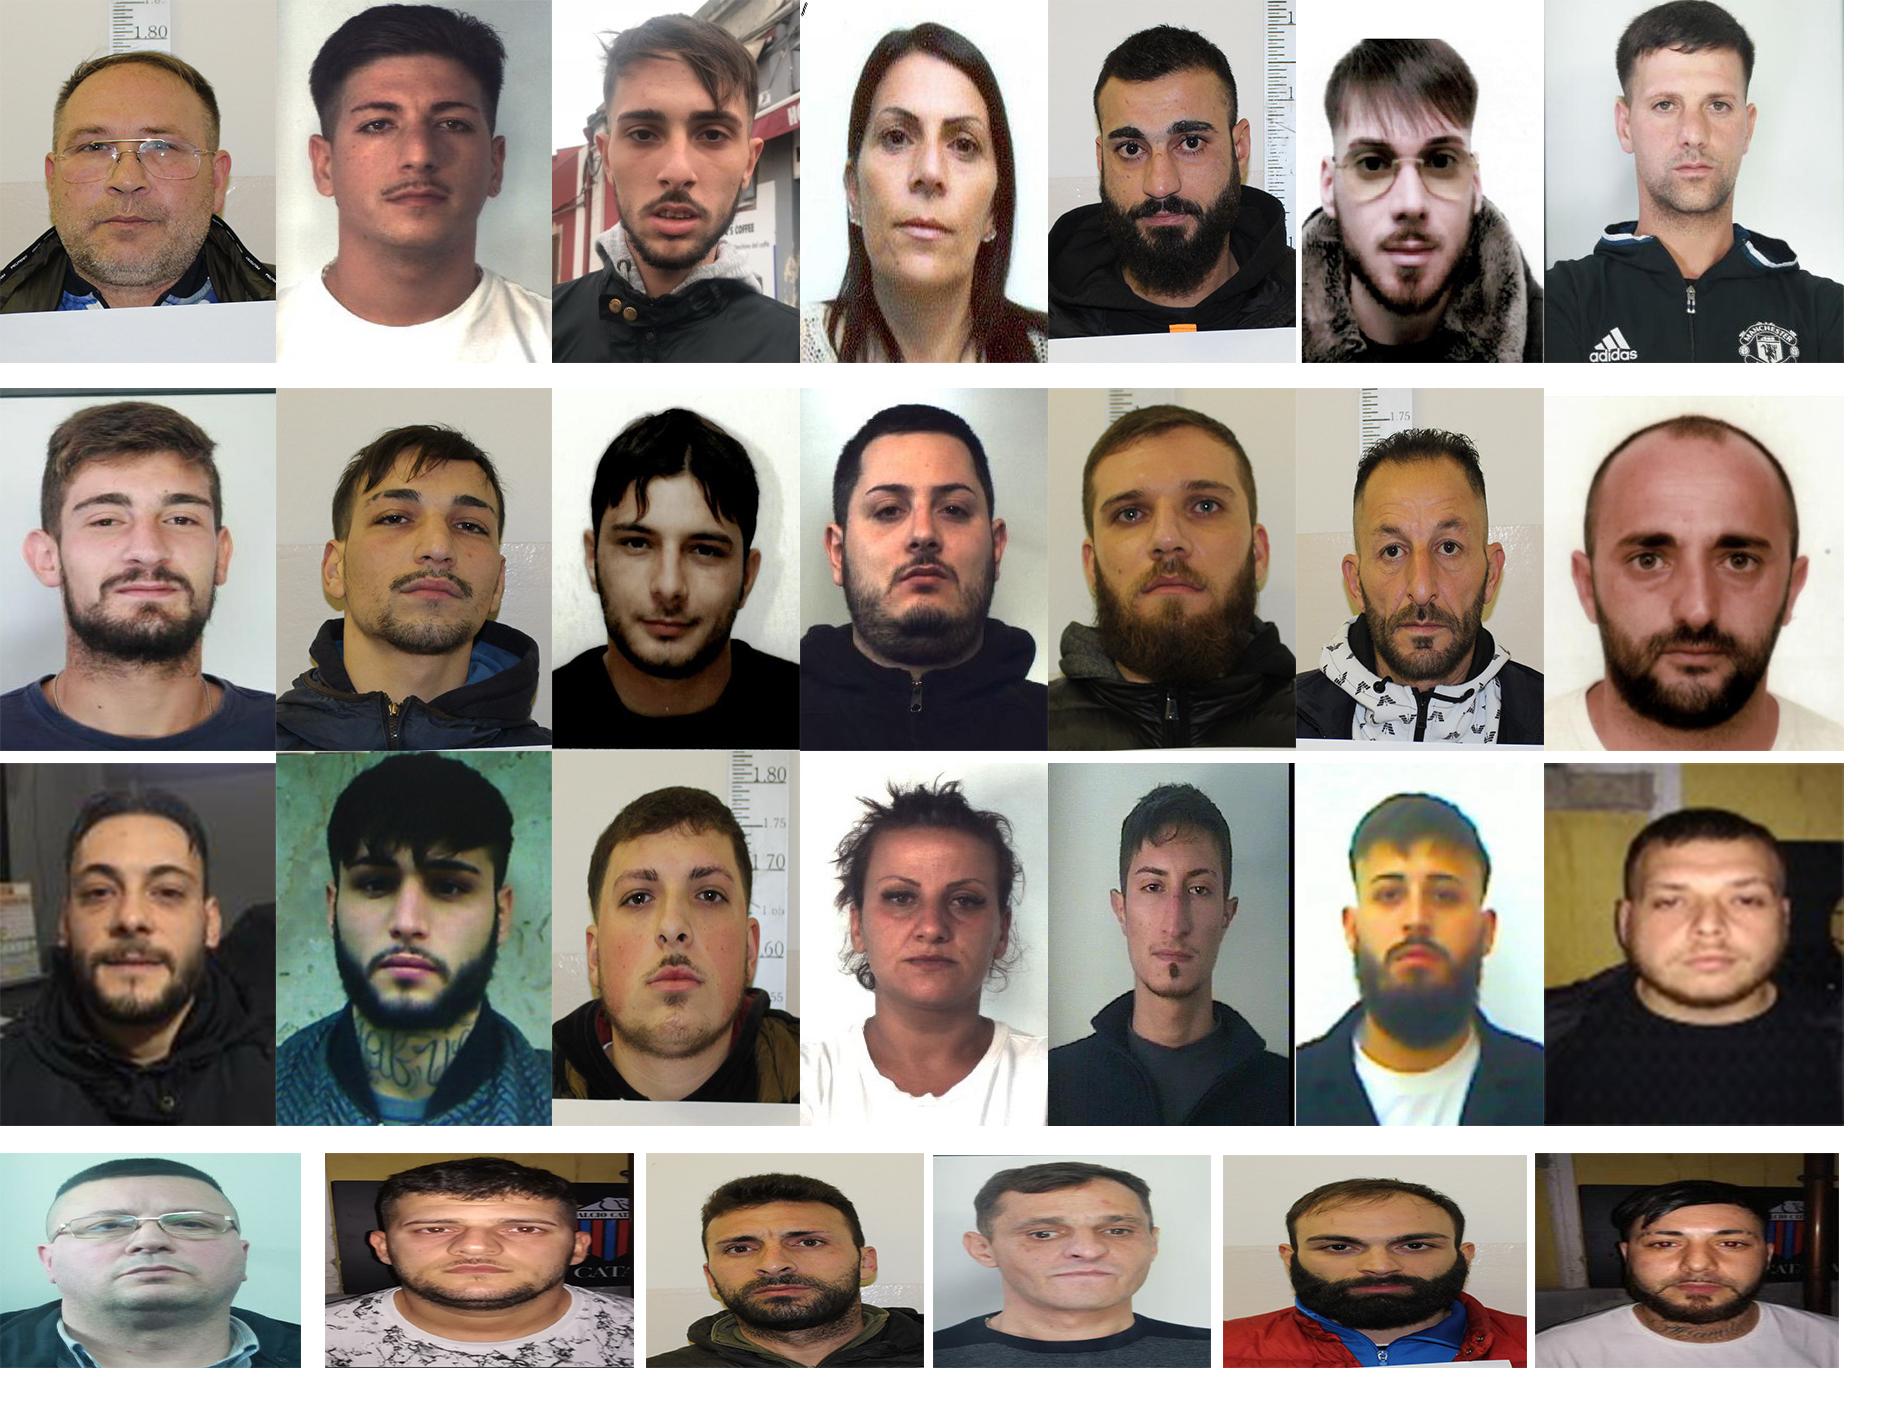 Ex calciatore di Catania e Siracusa gestiva piazza di spaccio: 25 arresti